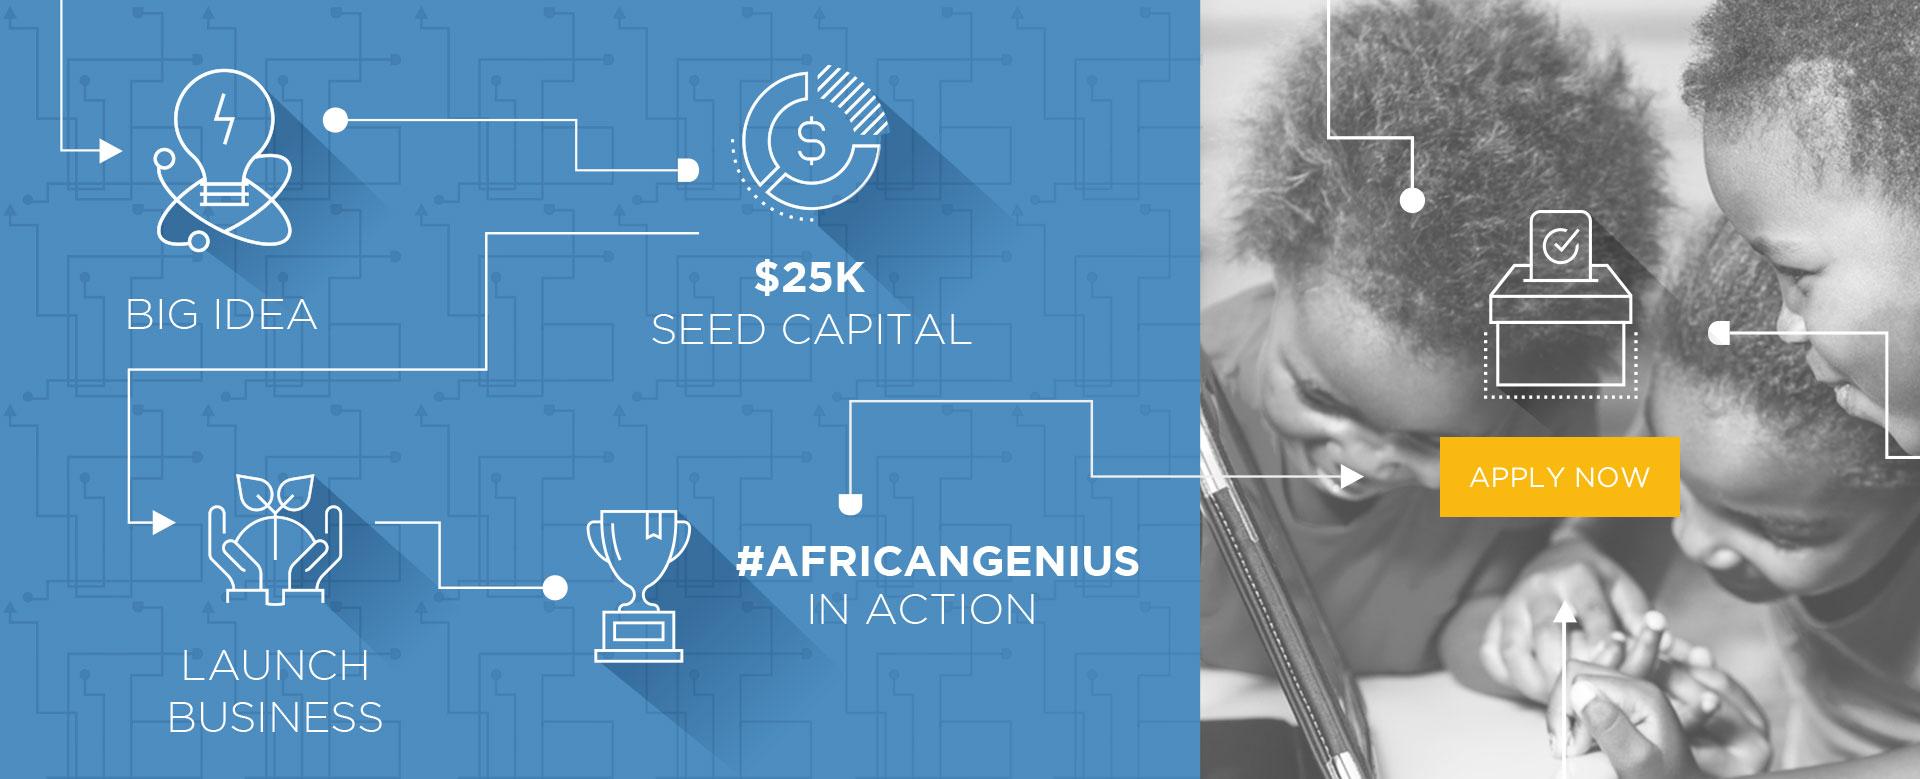 MTN Entrepreneurship Challenge – Teams to Win Over $75,000 in Prizes